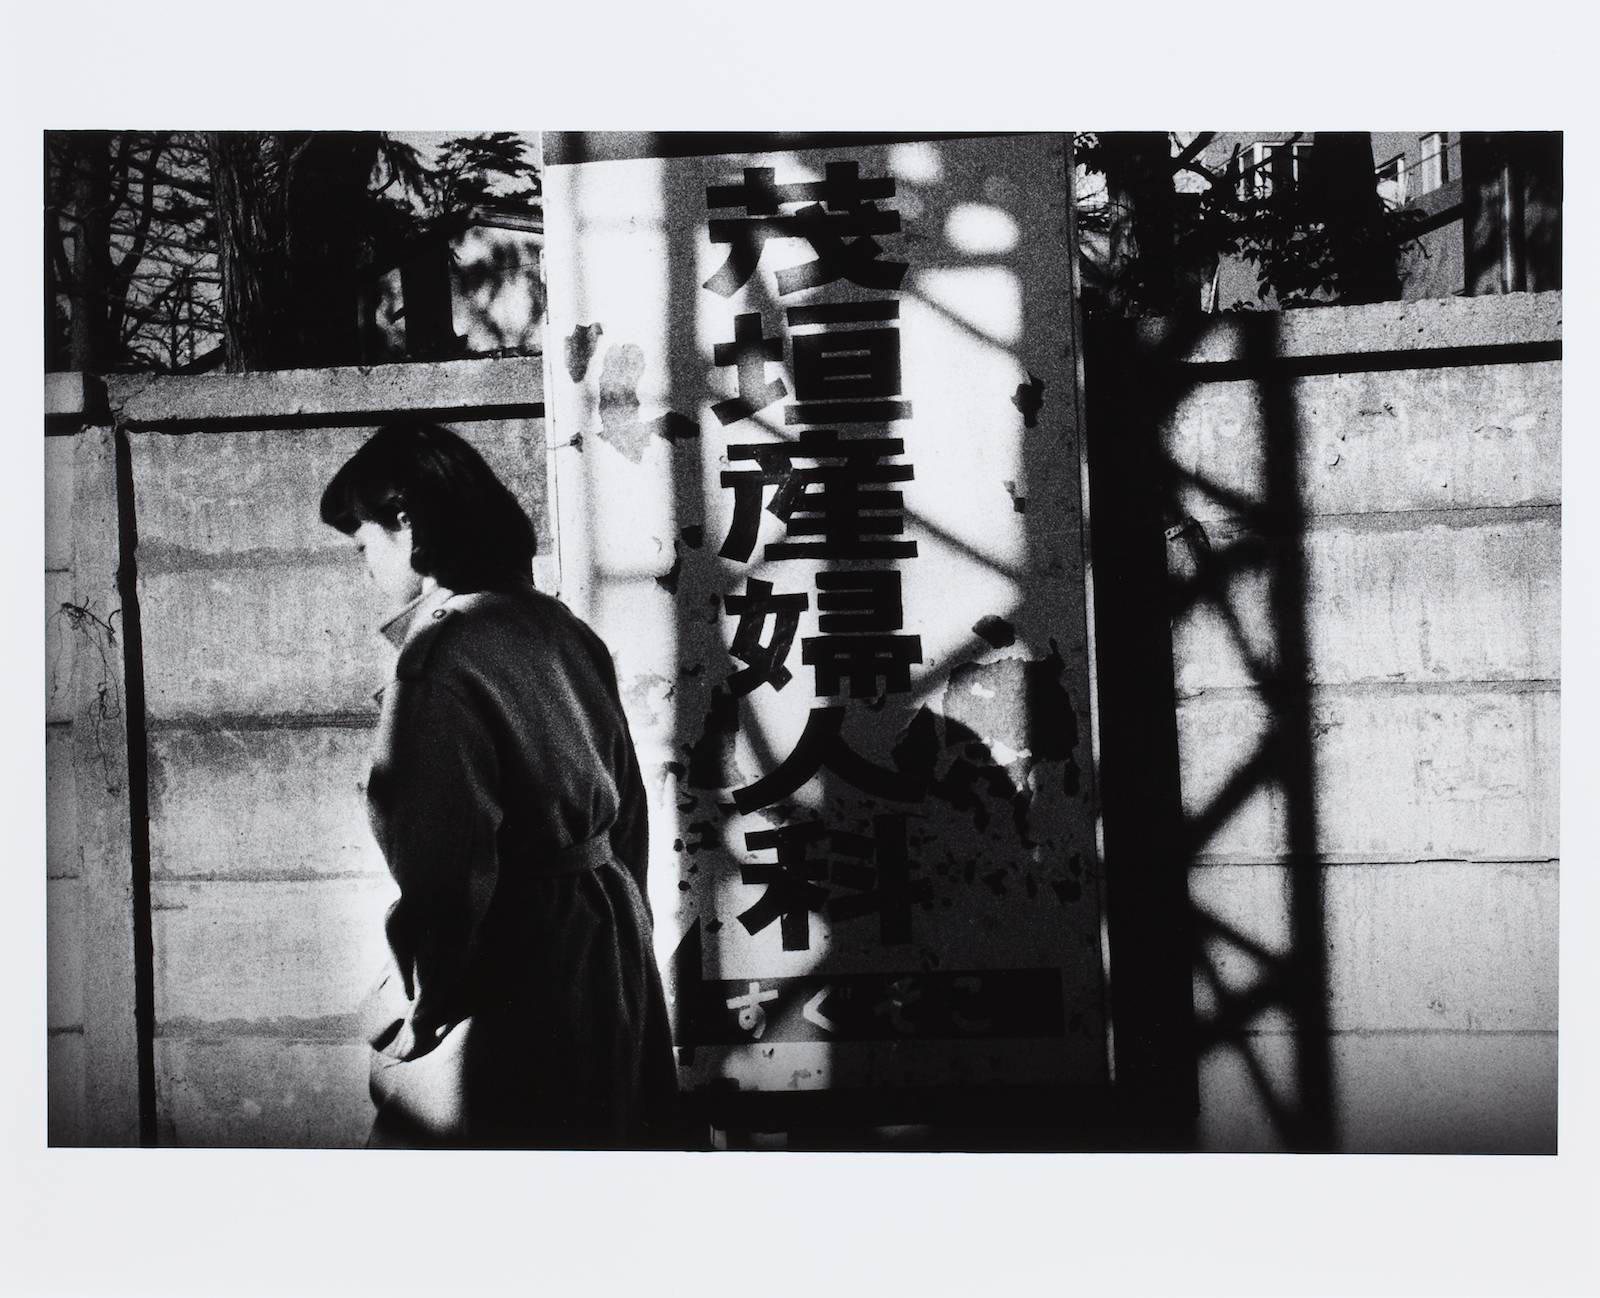 Kamikitazawa, 1970s/2013, silver gelatin print, 27,9 x 41,3 cm